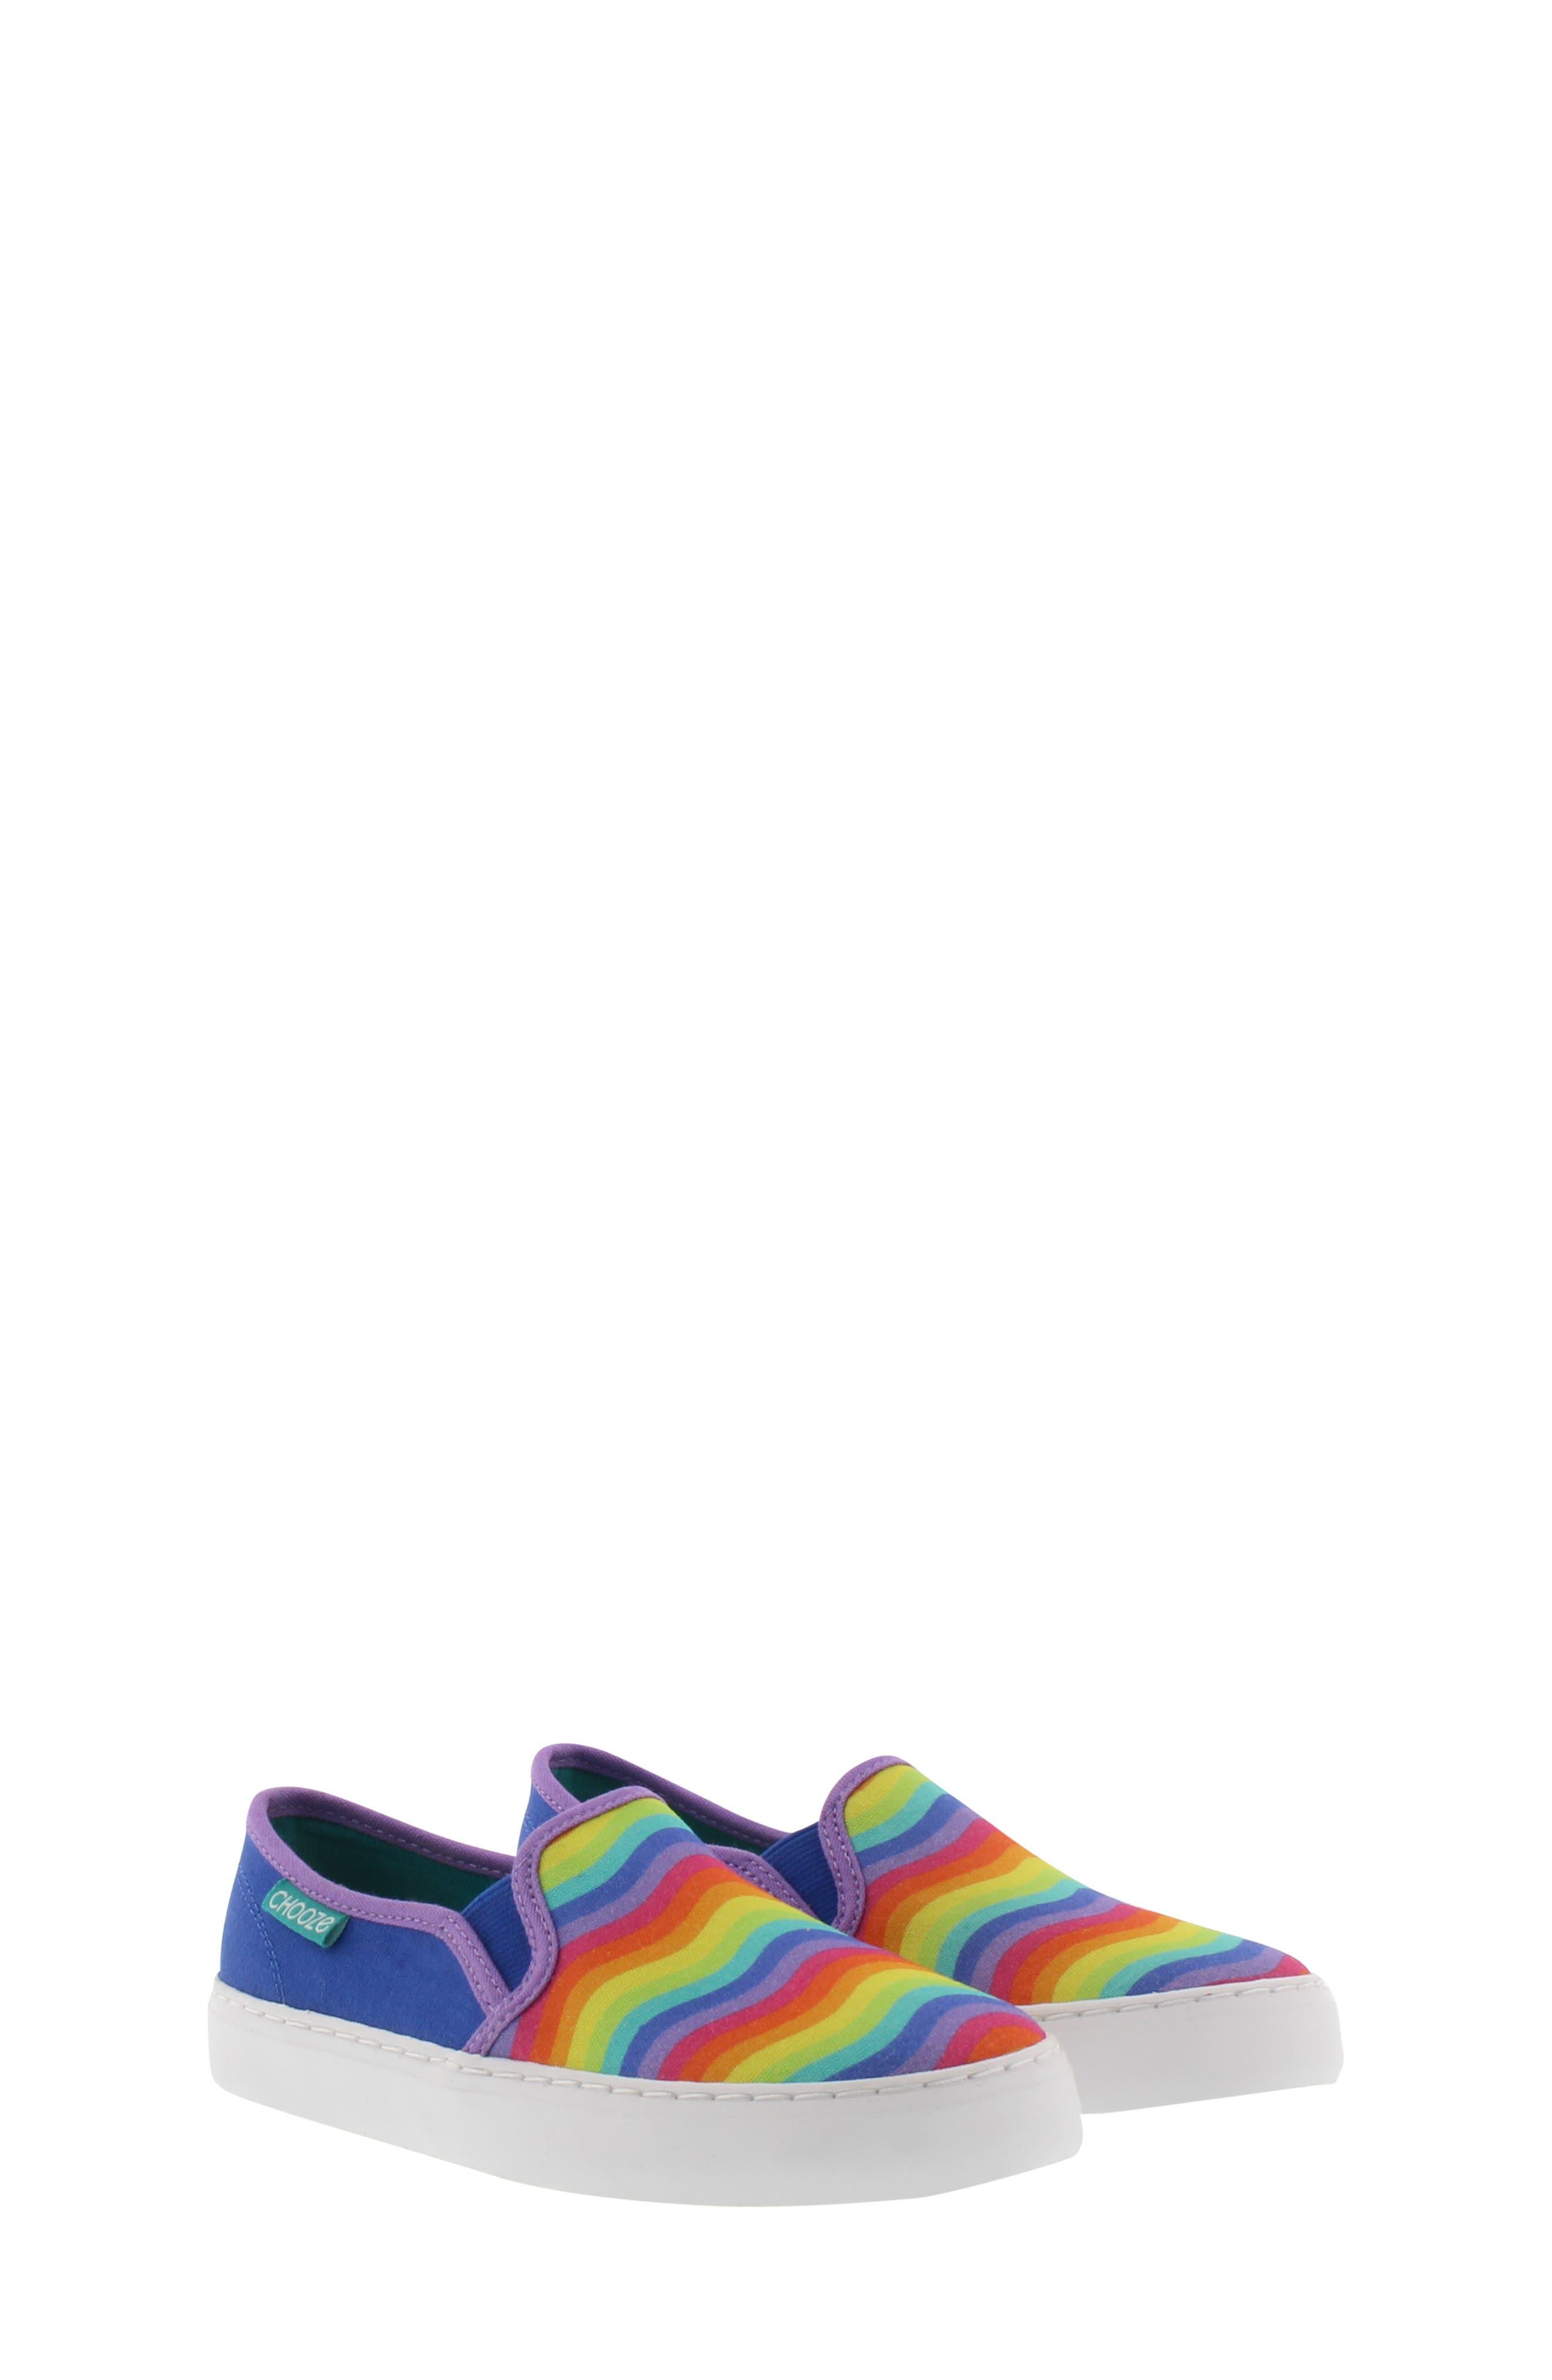 CHOOZE Motion Slip-On Sneaker, Main, color, BLUE MULTI